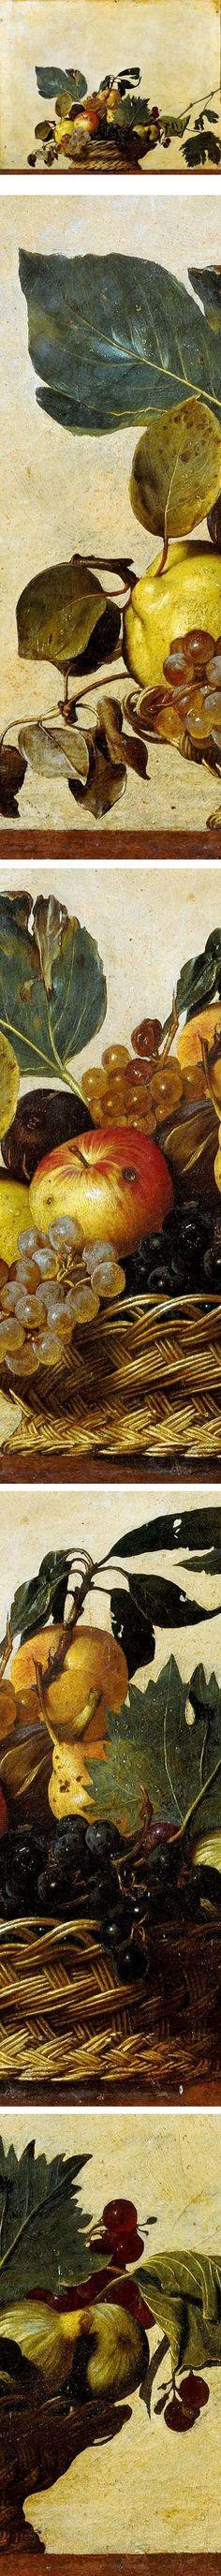 Basket of Fruit, Caravaggio (Michelangelo Merisi da Caravaggio) ... vibration of his colours are ... litherally edible,if I may... :) Sensational !: